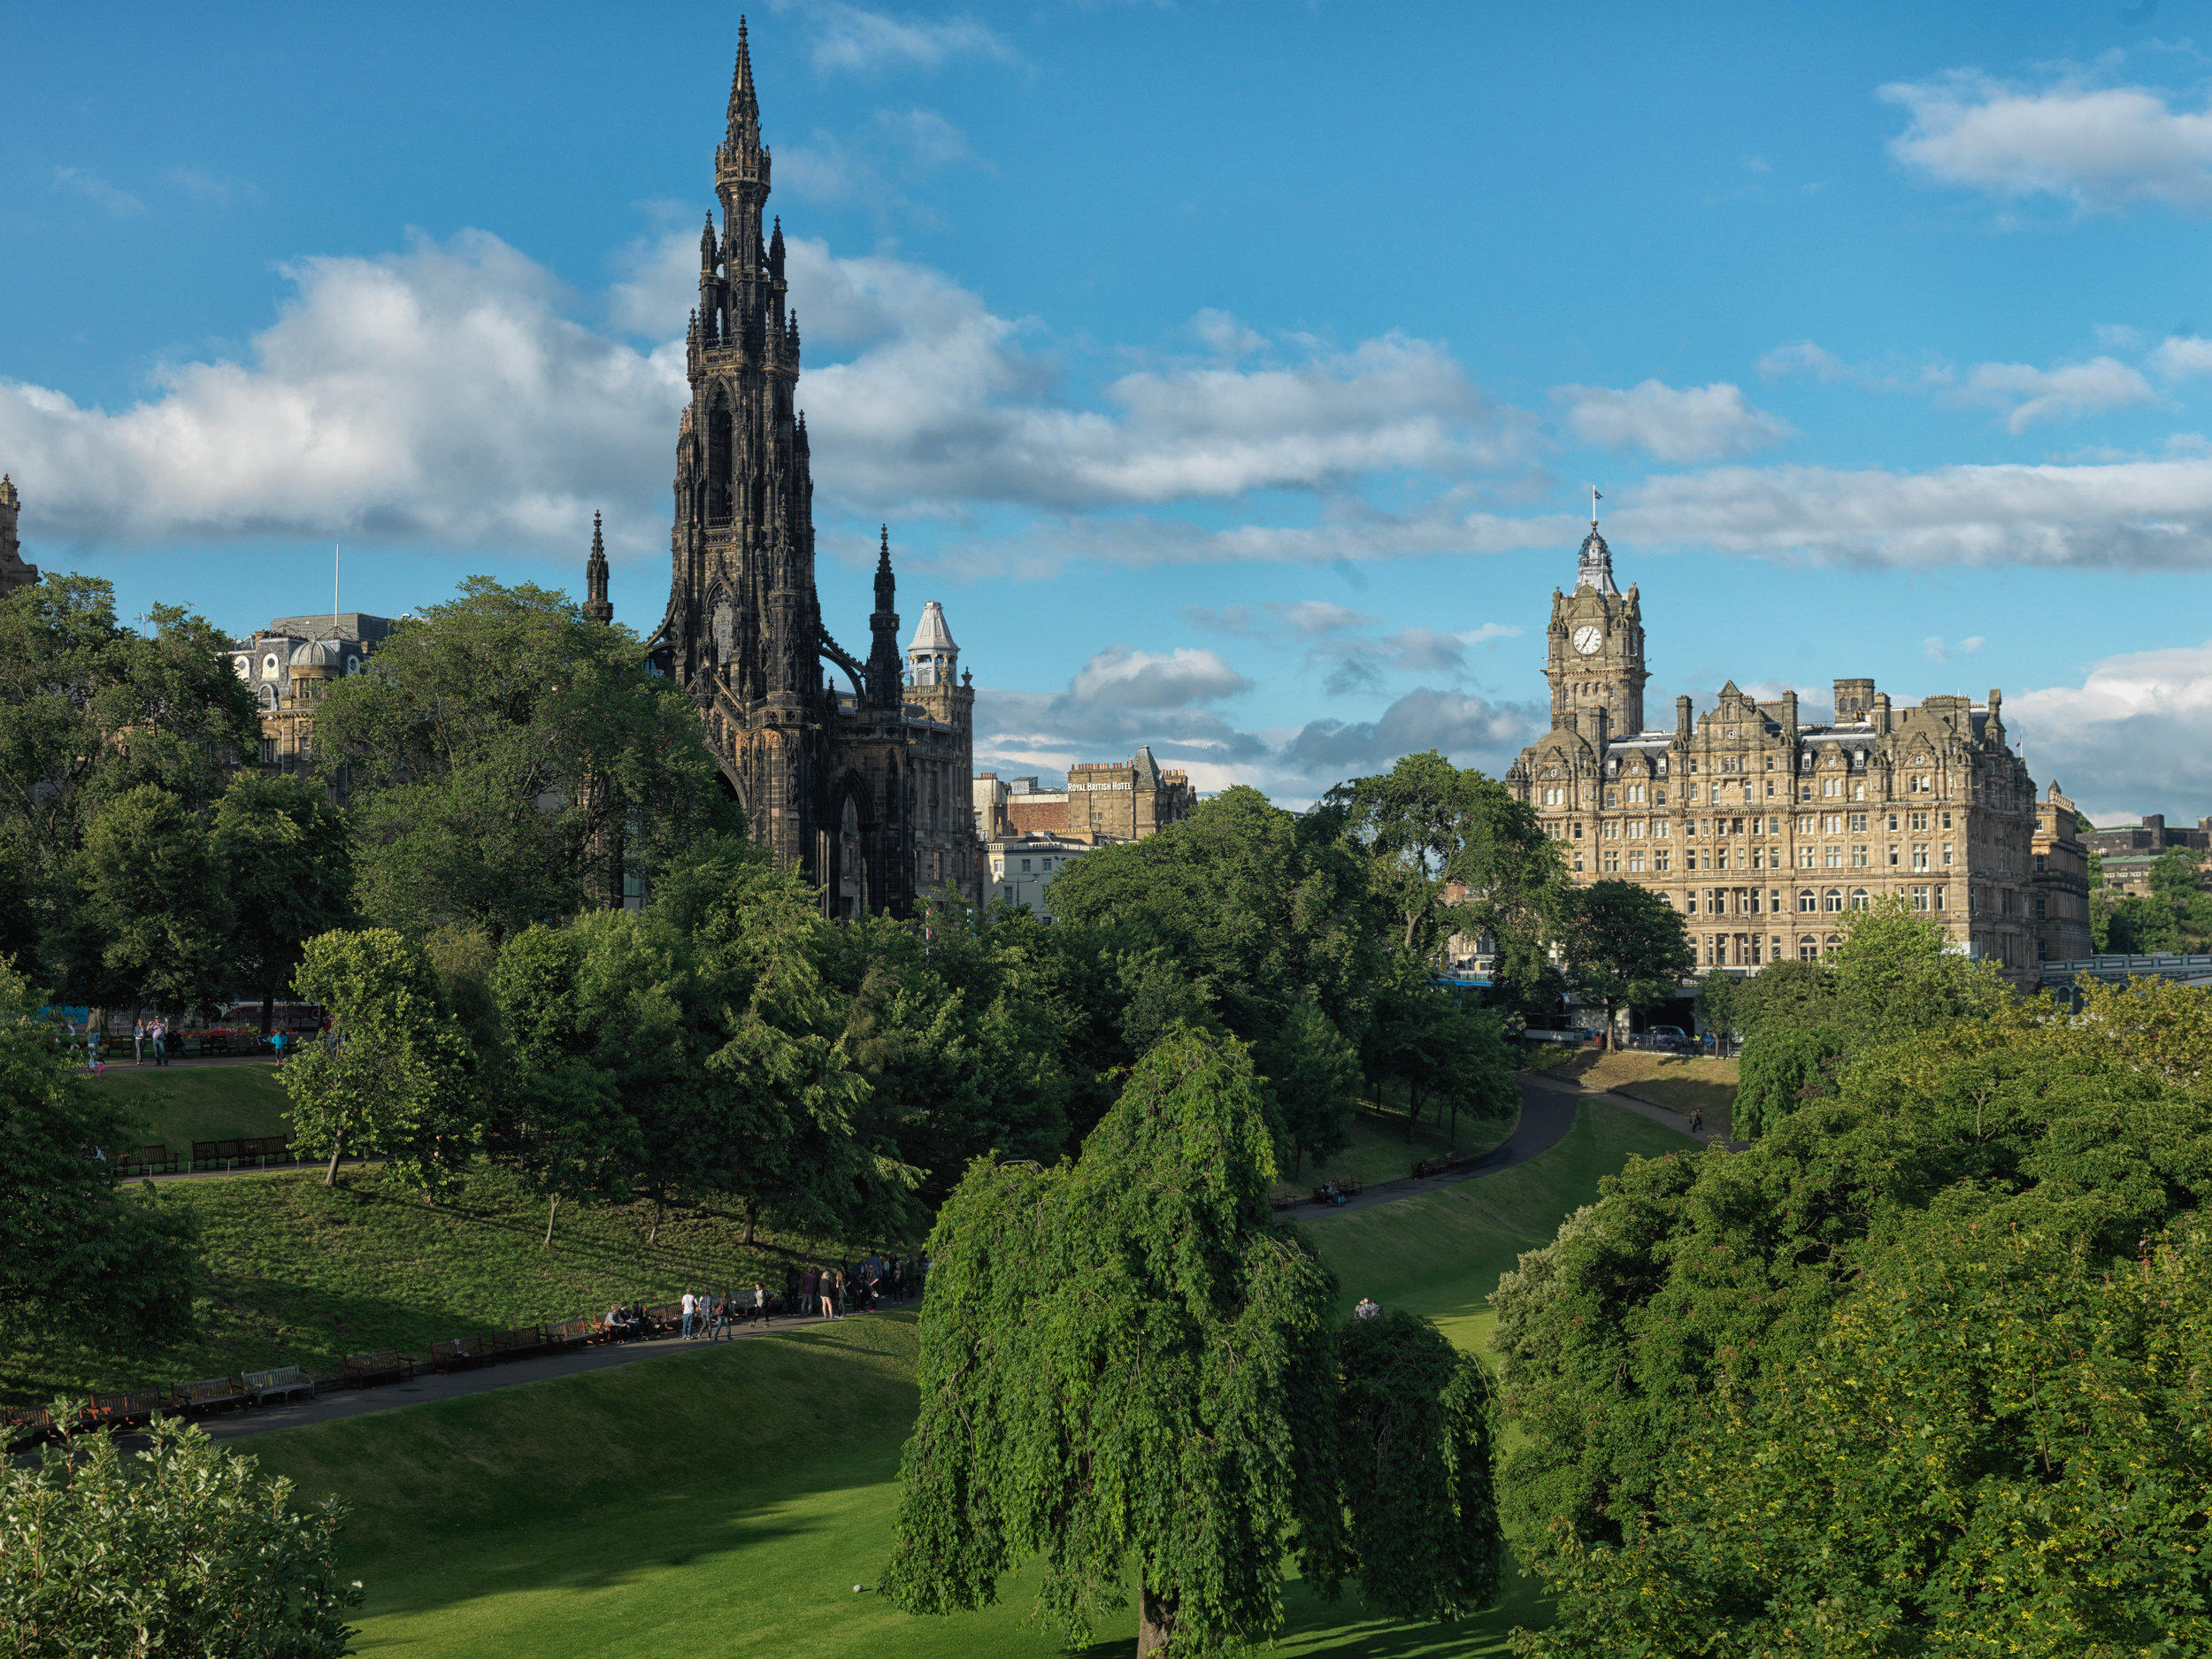 The Balmoral, Edinburgh